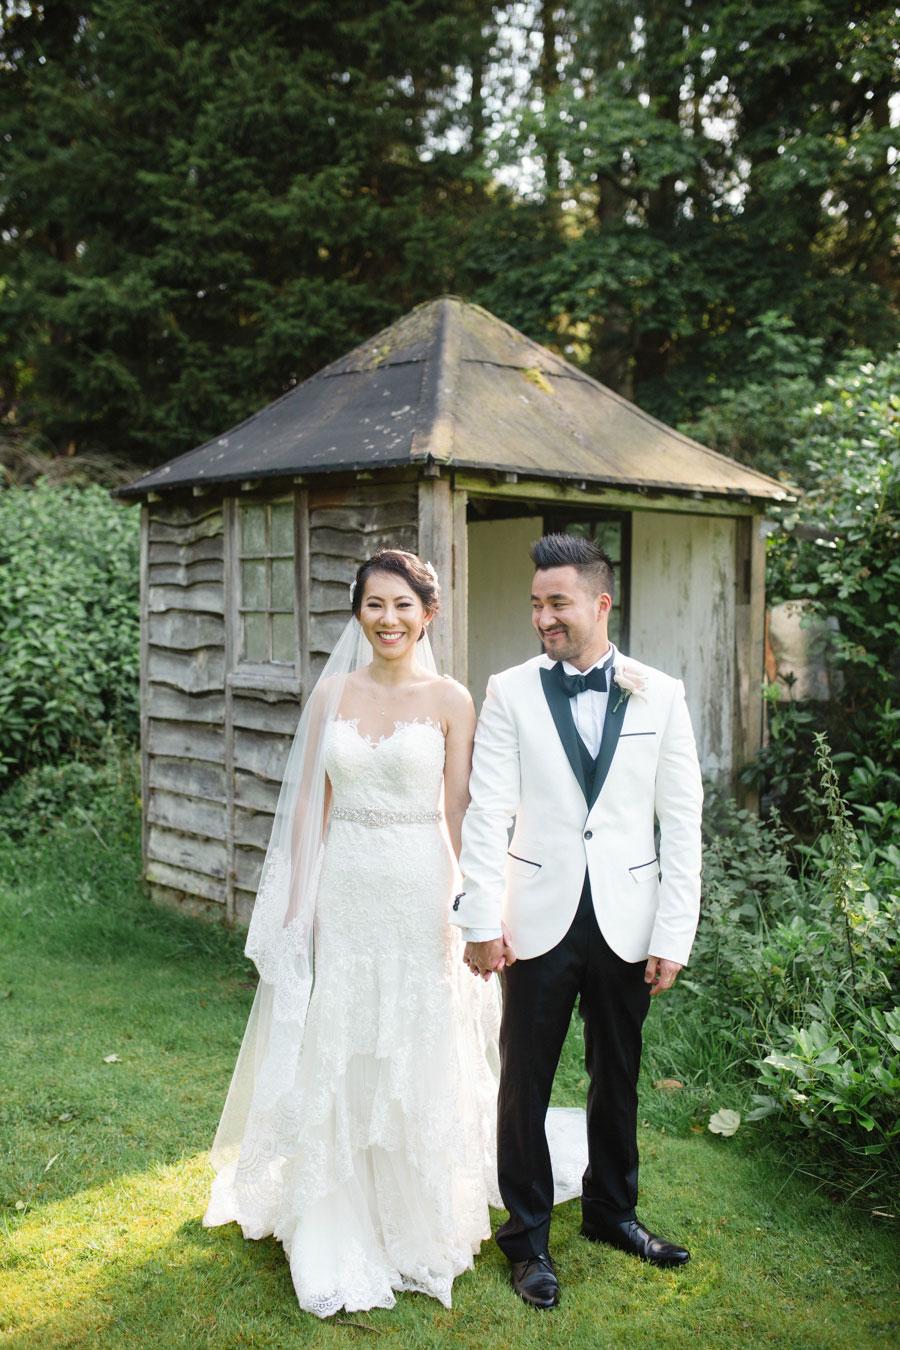 Stately Home Ballroom Wedding With Romantic Vintage Style: Tania & David